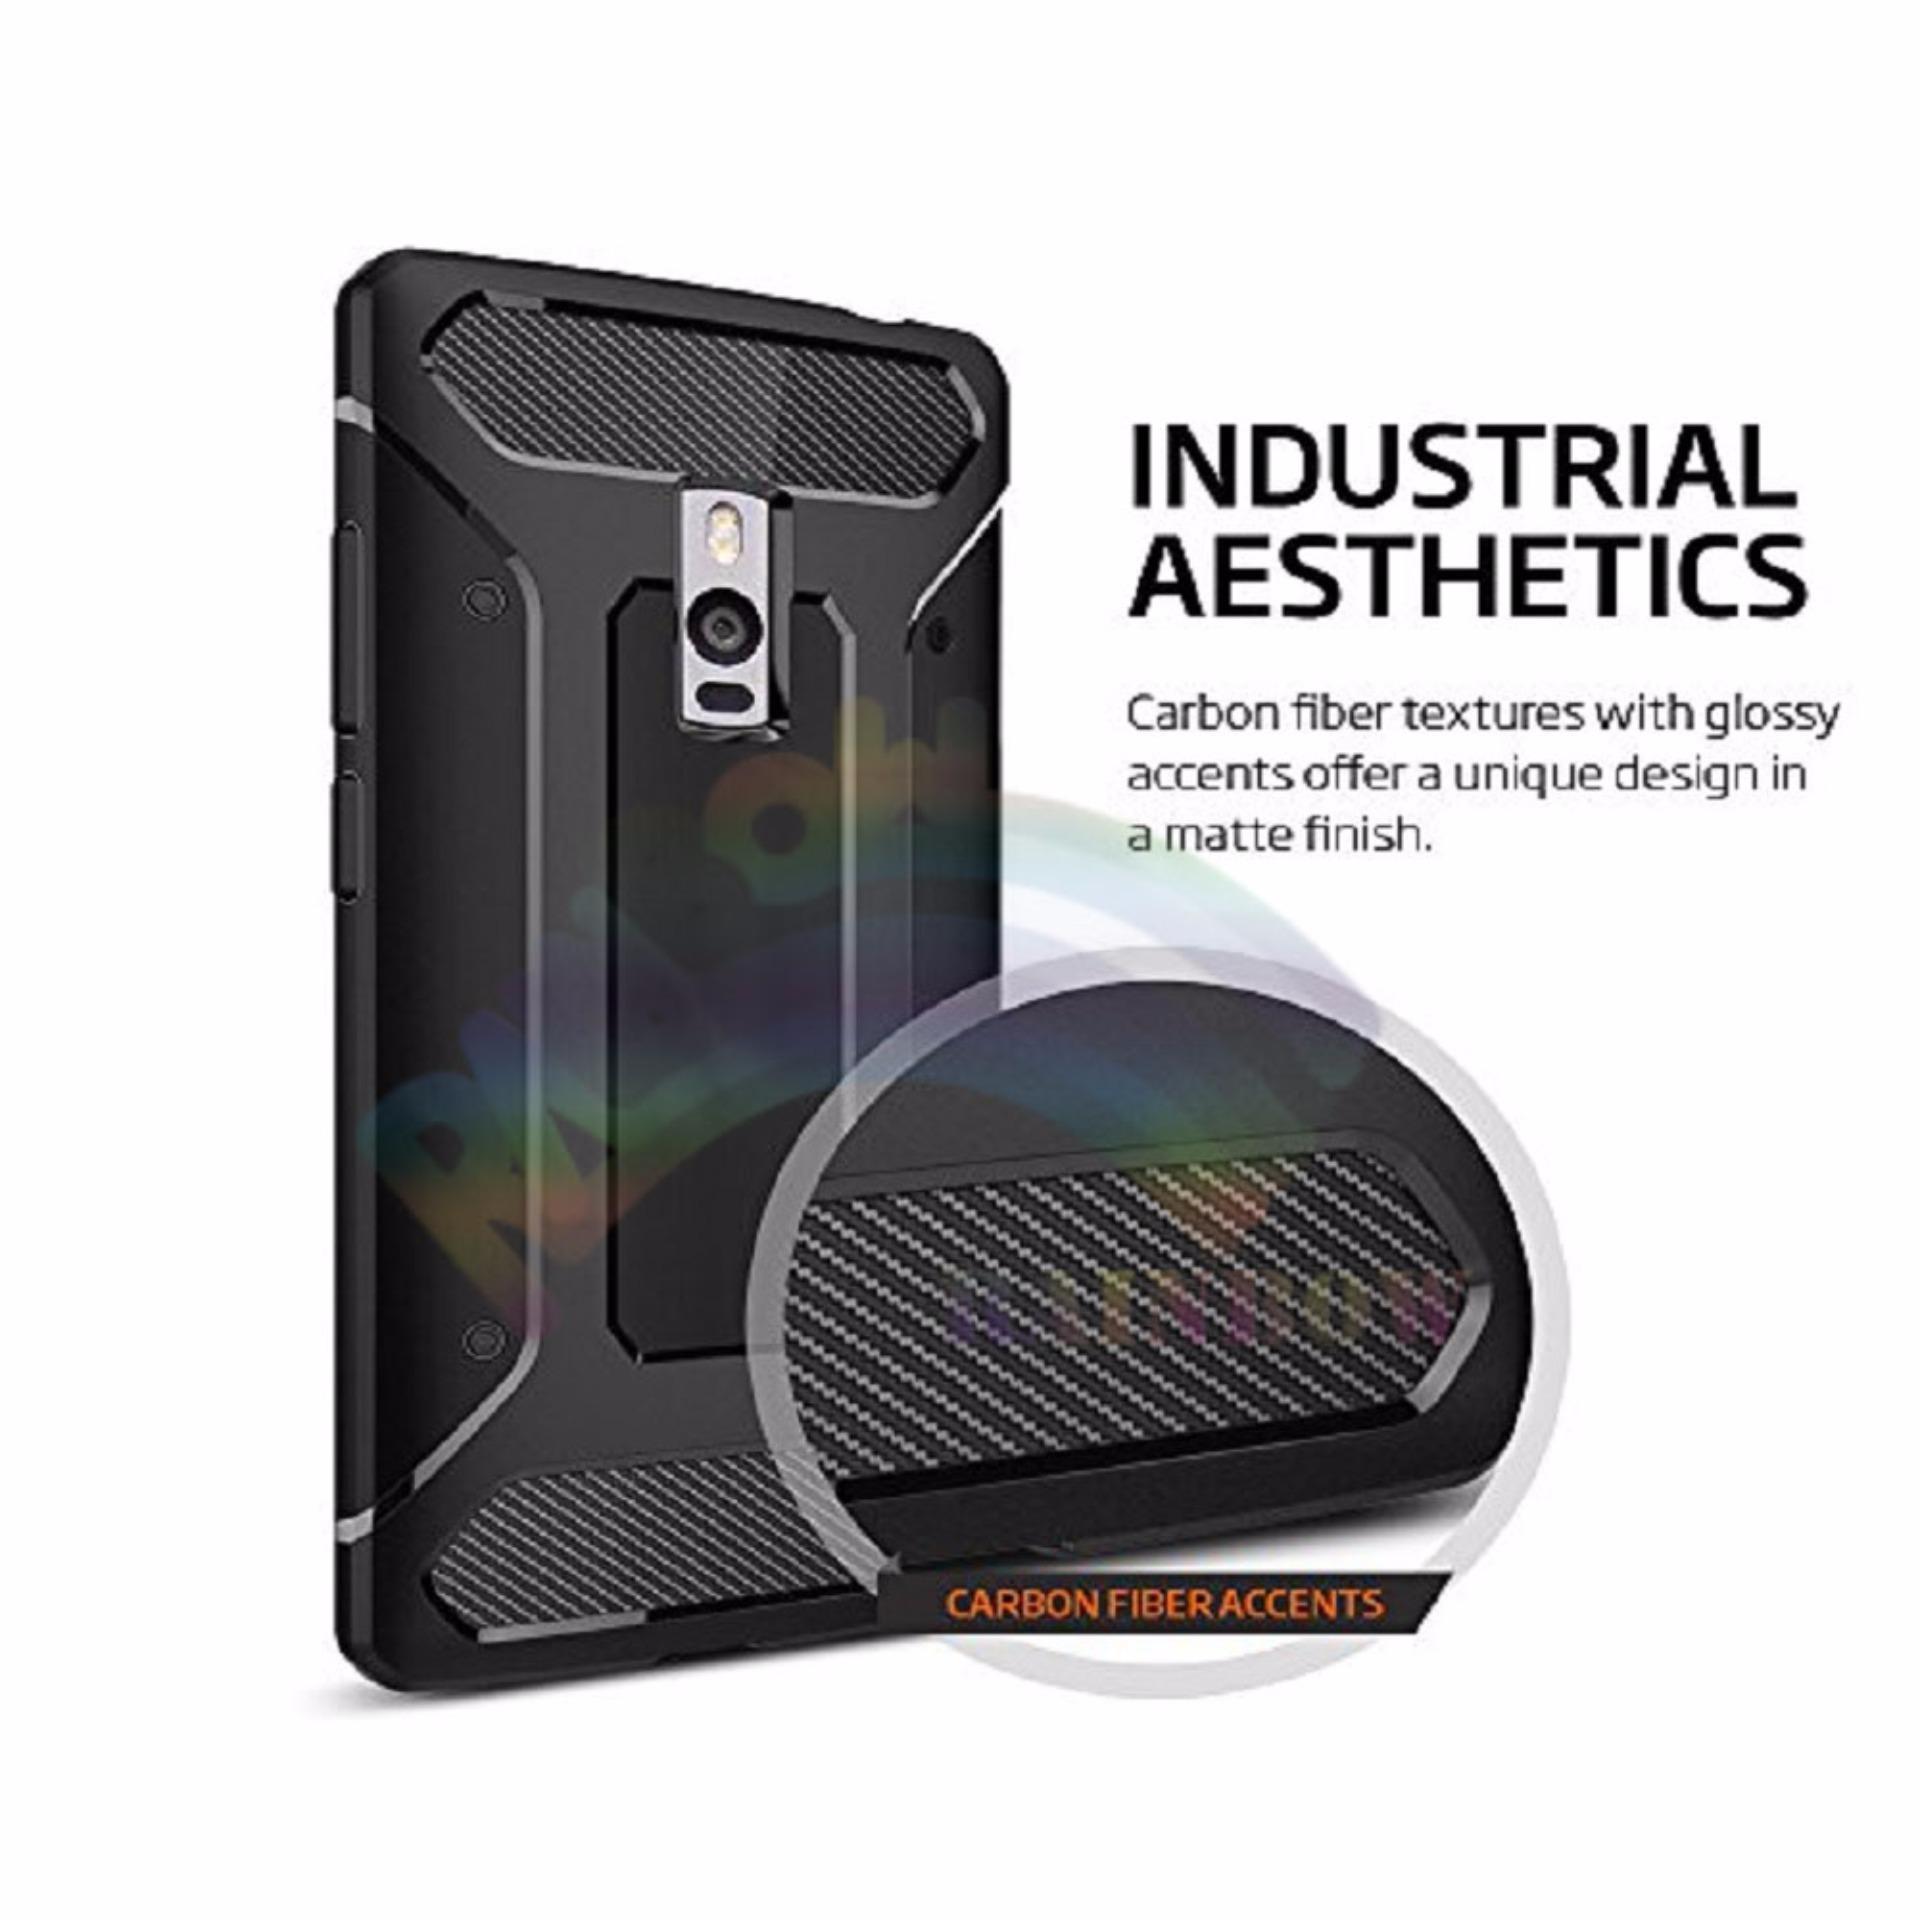 ... Rainbow Oppo Neo 9 A37 Soft Case Ultra Rugged Capsule Slim AirCushion Tecknologi Line Glossy Design ...